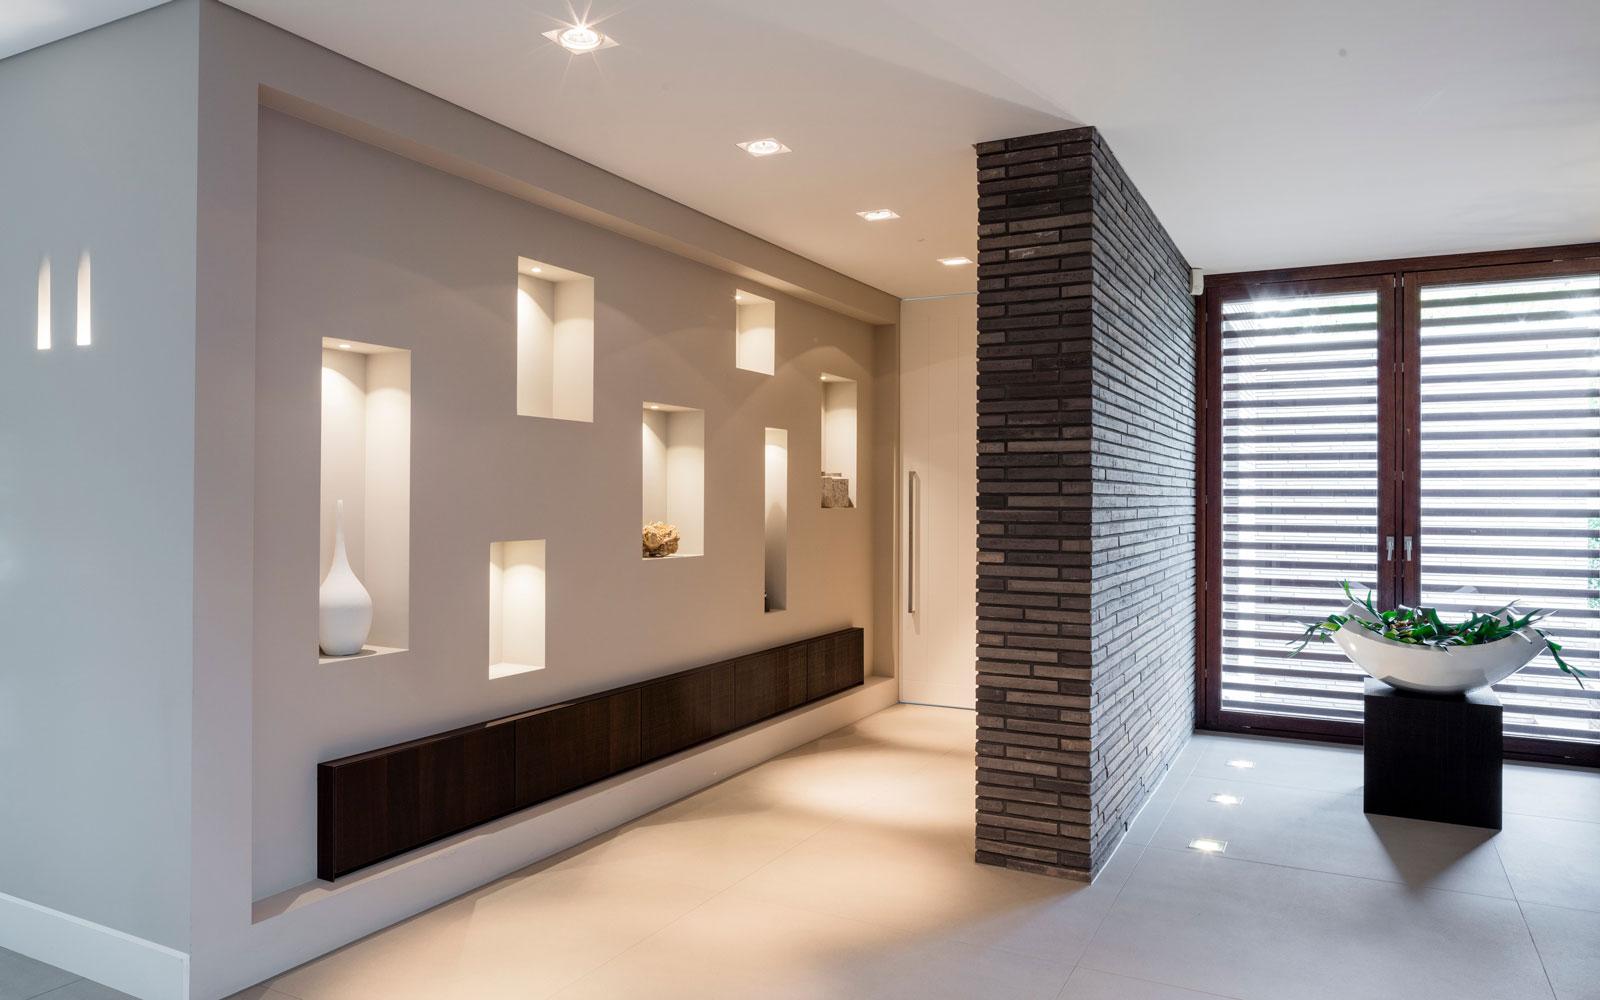 Entree, lampen, muur, afscheiding, indrukwekkende verlichting, vloer, JP Flooring, moderne villa, François Hannes